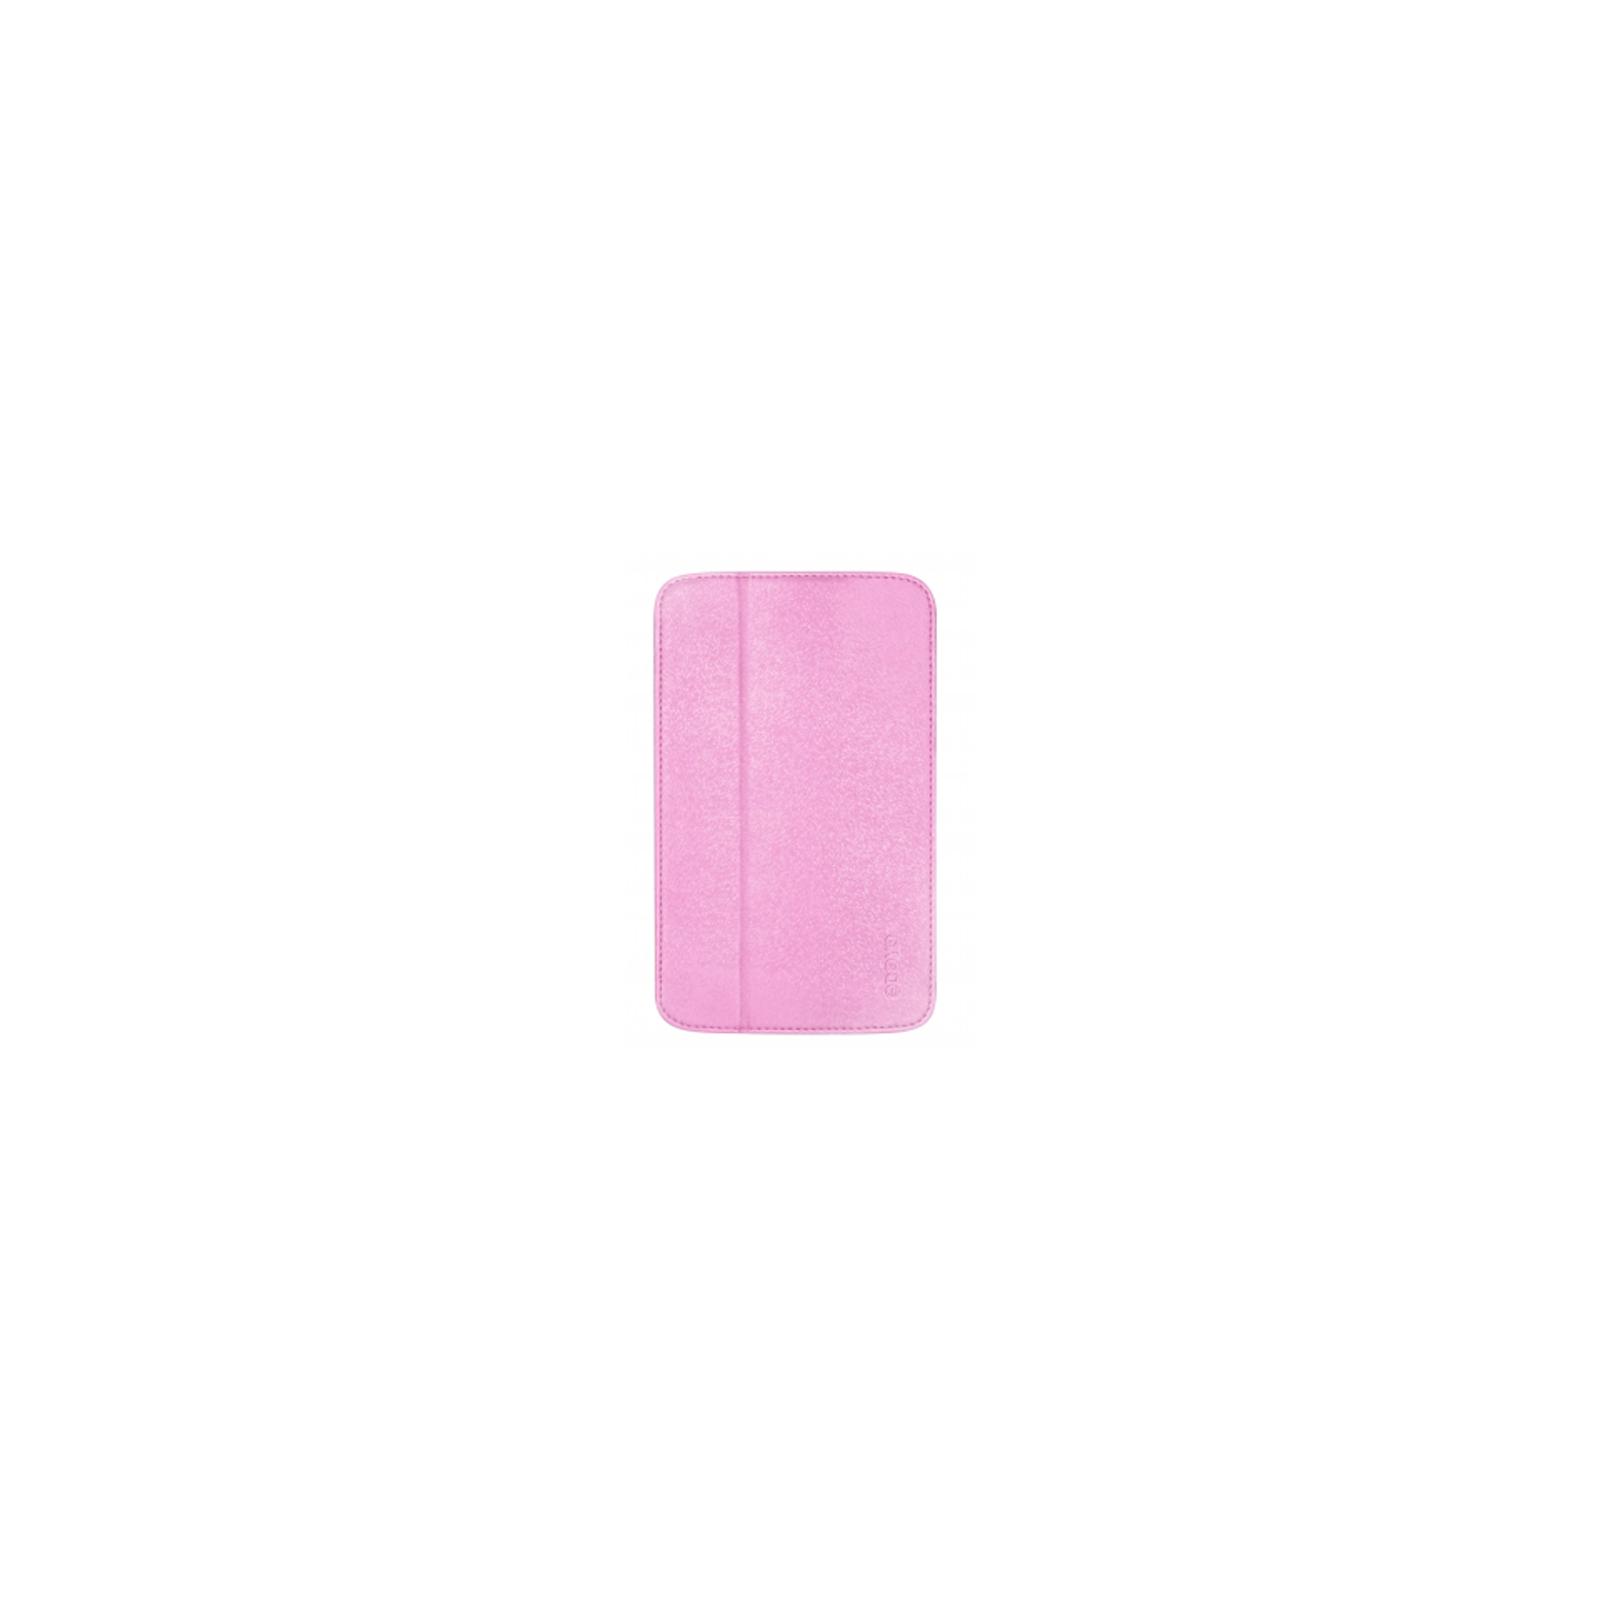 Чехол для планшета ODOYO Galaxy TabTAB3 8.0 /GLITZ COAT FOLIO ANGEL PINK (PH623PK)